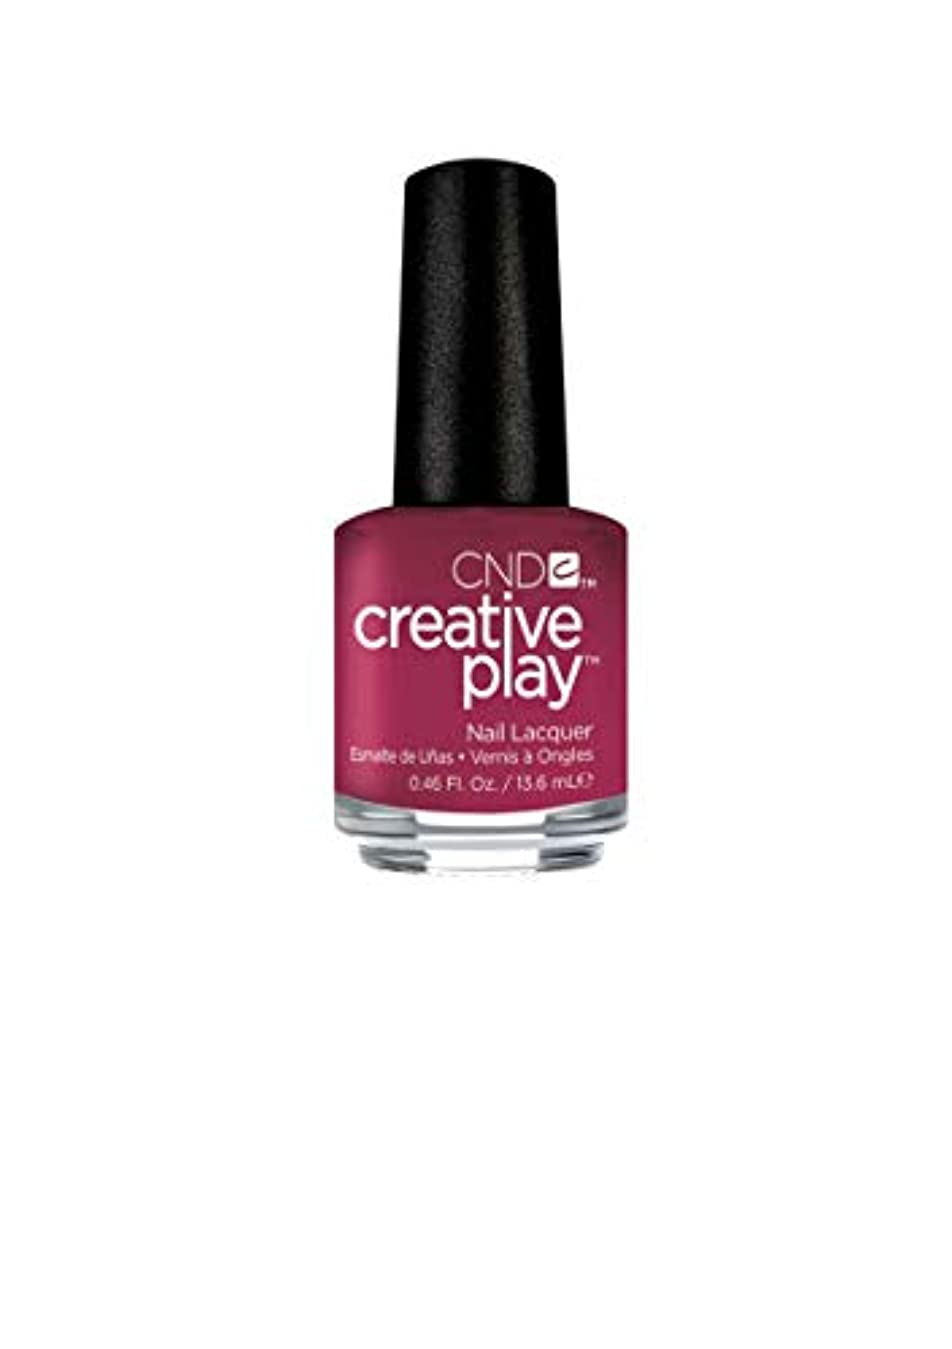 CND Creative Play Lacquer - Berried Secrets - 0.46oz / 13.6ml